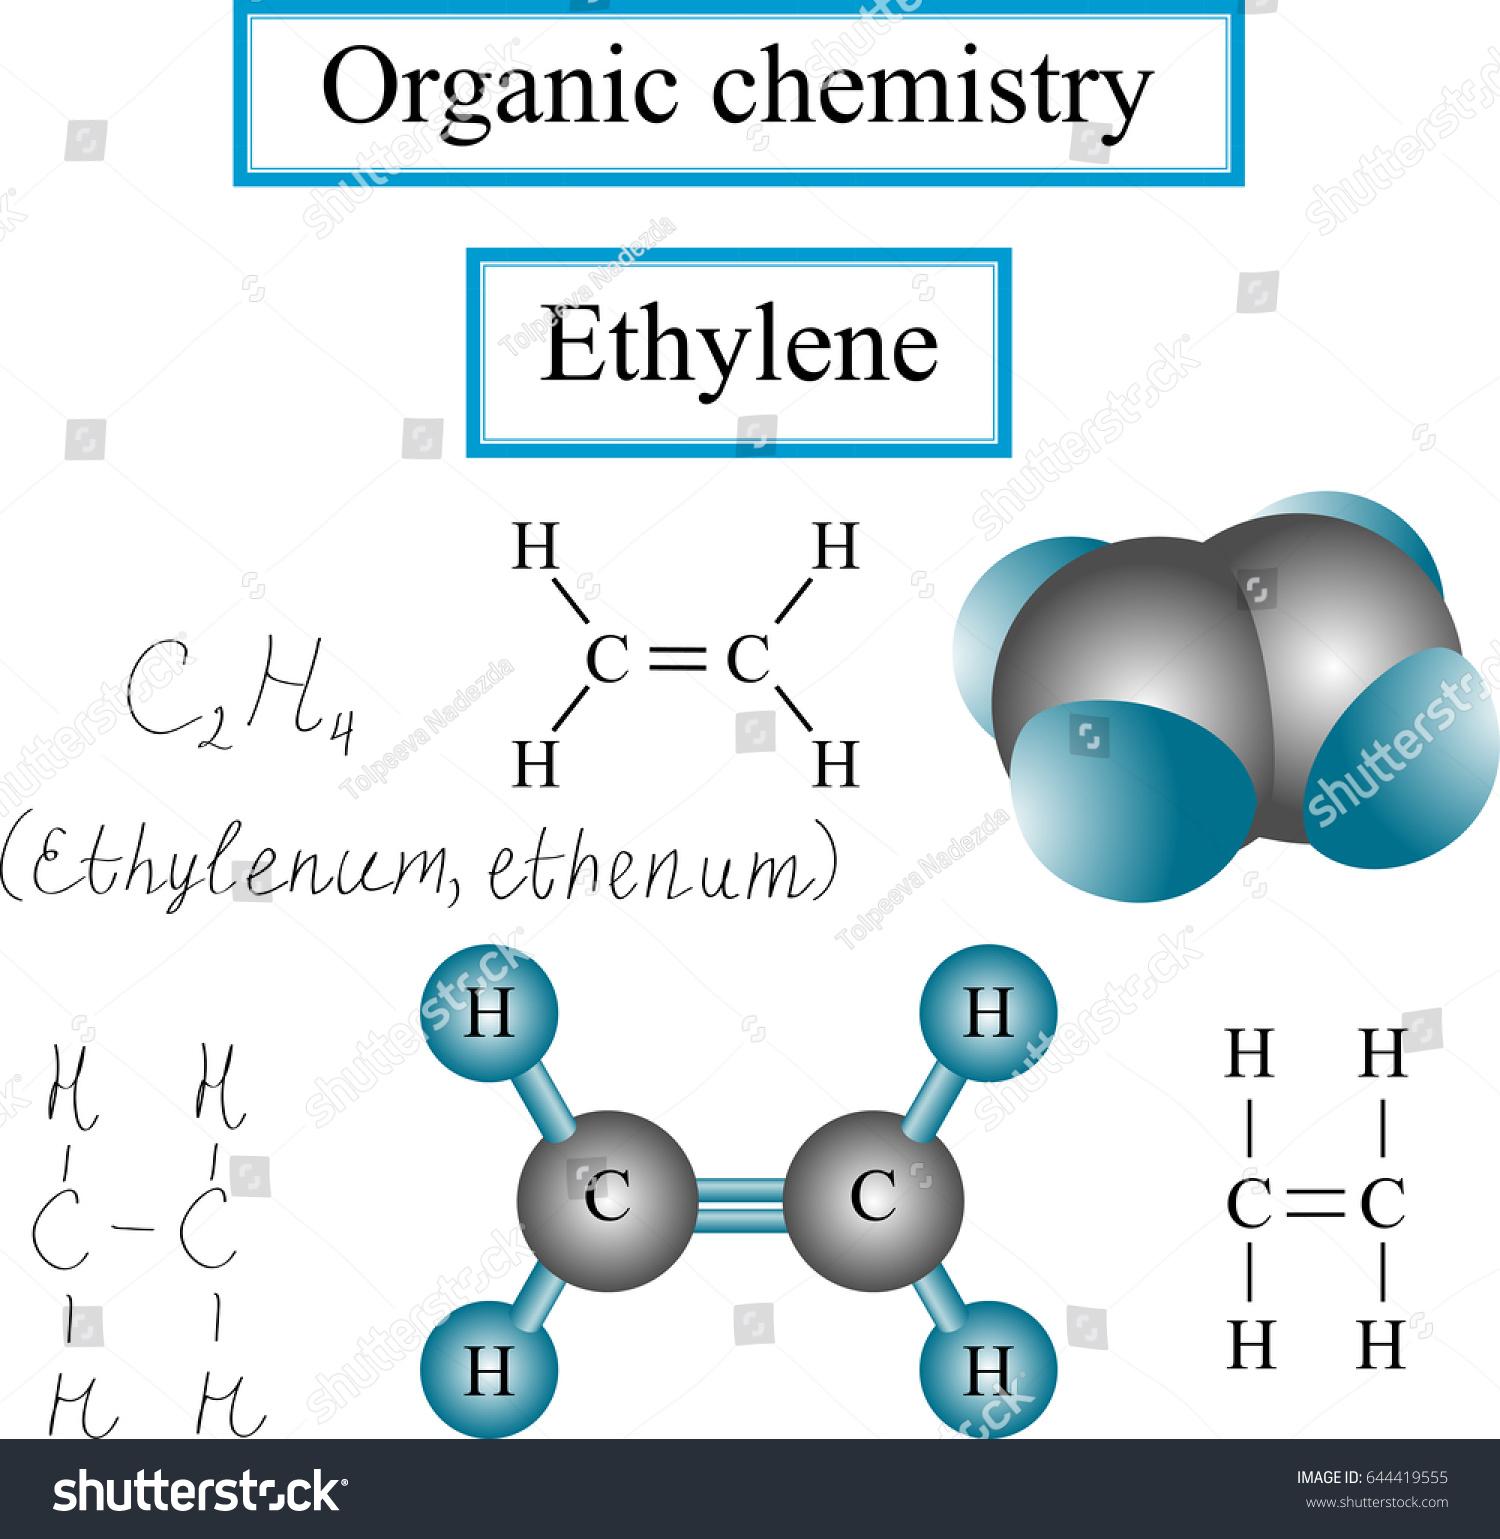 Tell me the formula of ethene and ethylene